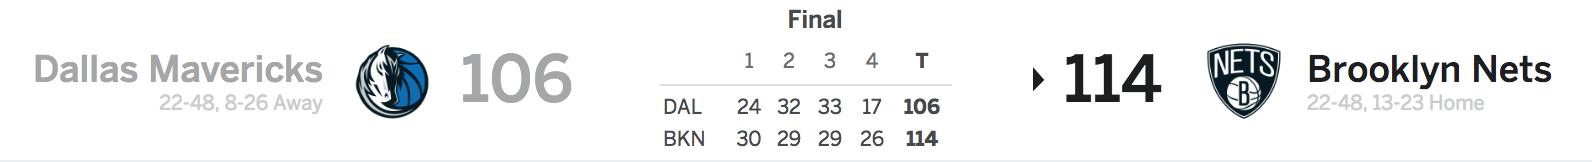 Brooklyn Nets vs Dallas Mavericks 3-17-18 Score